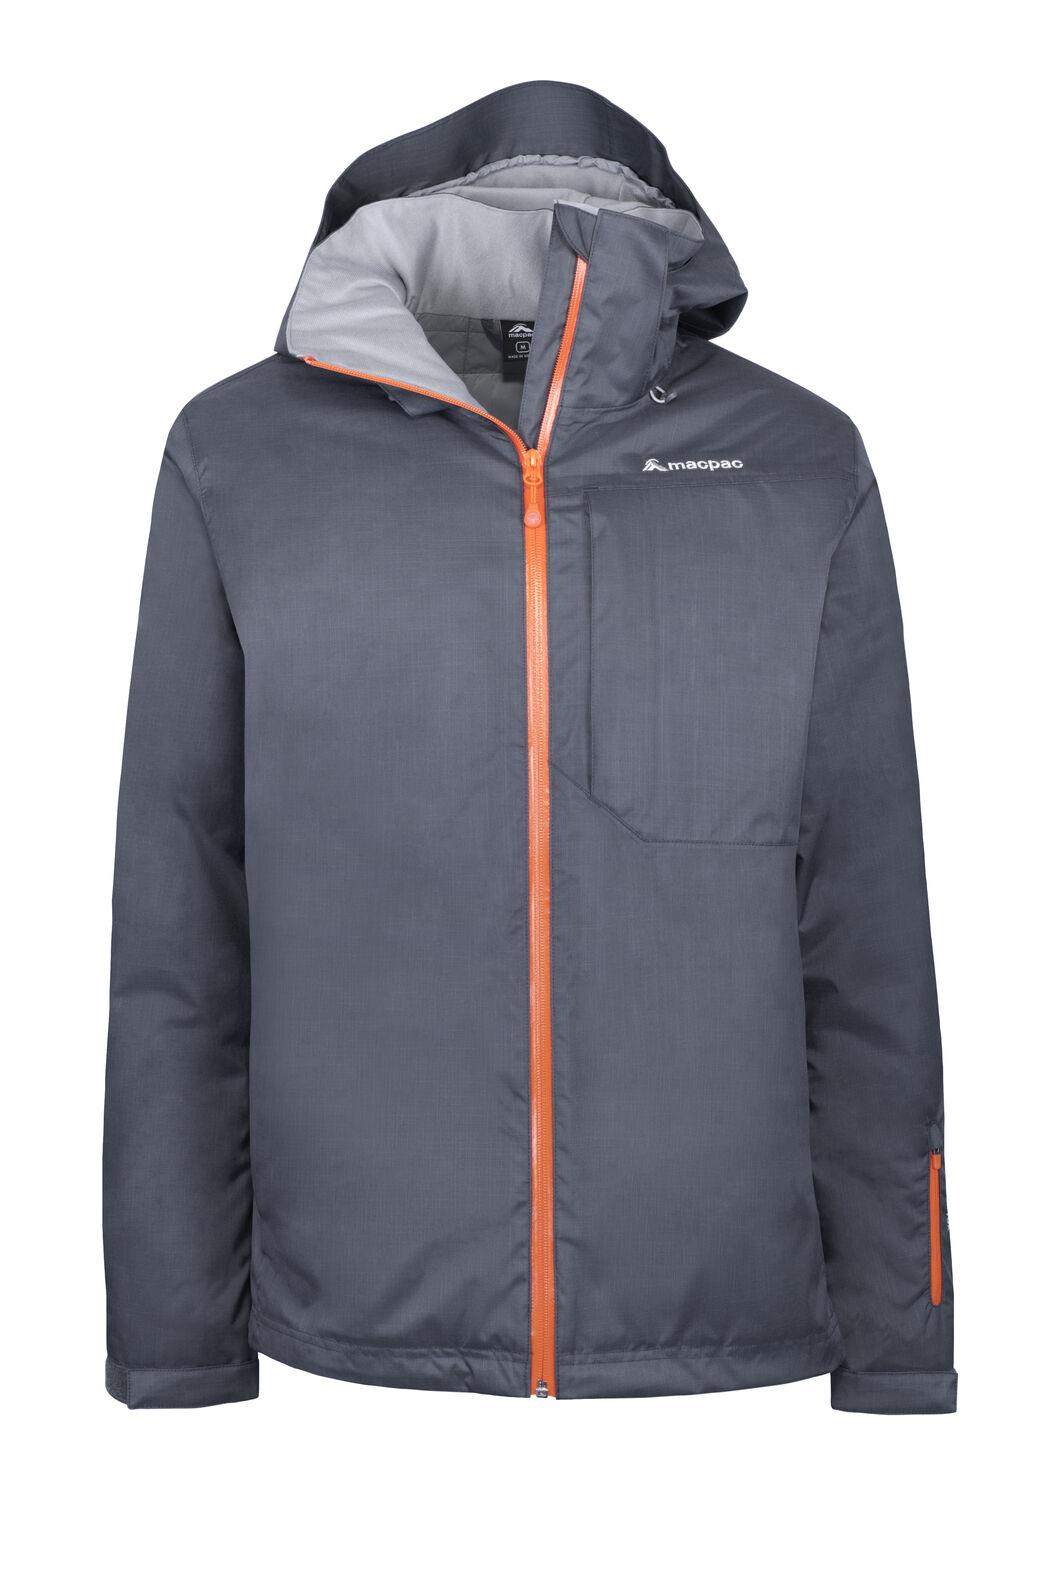 Macpac Powder Reflex™ Ski Jacket — Men's, India Ink/Flame, hi-res